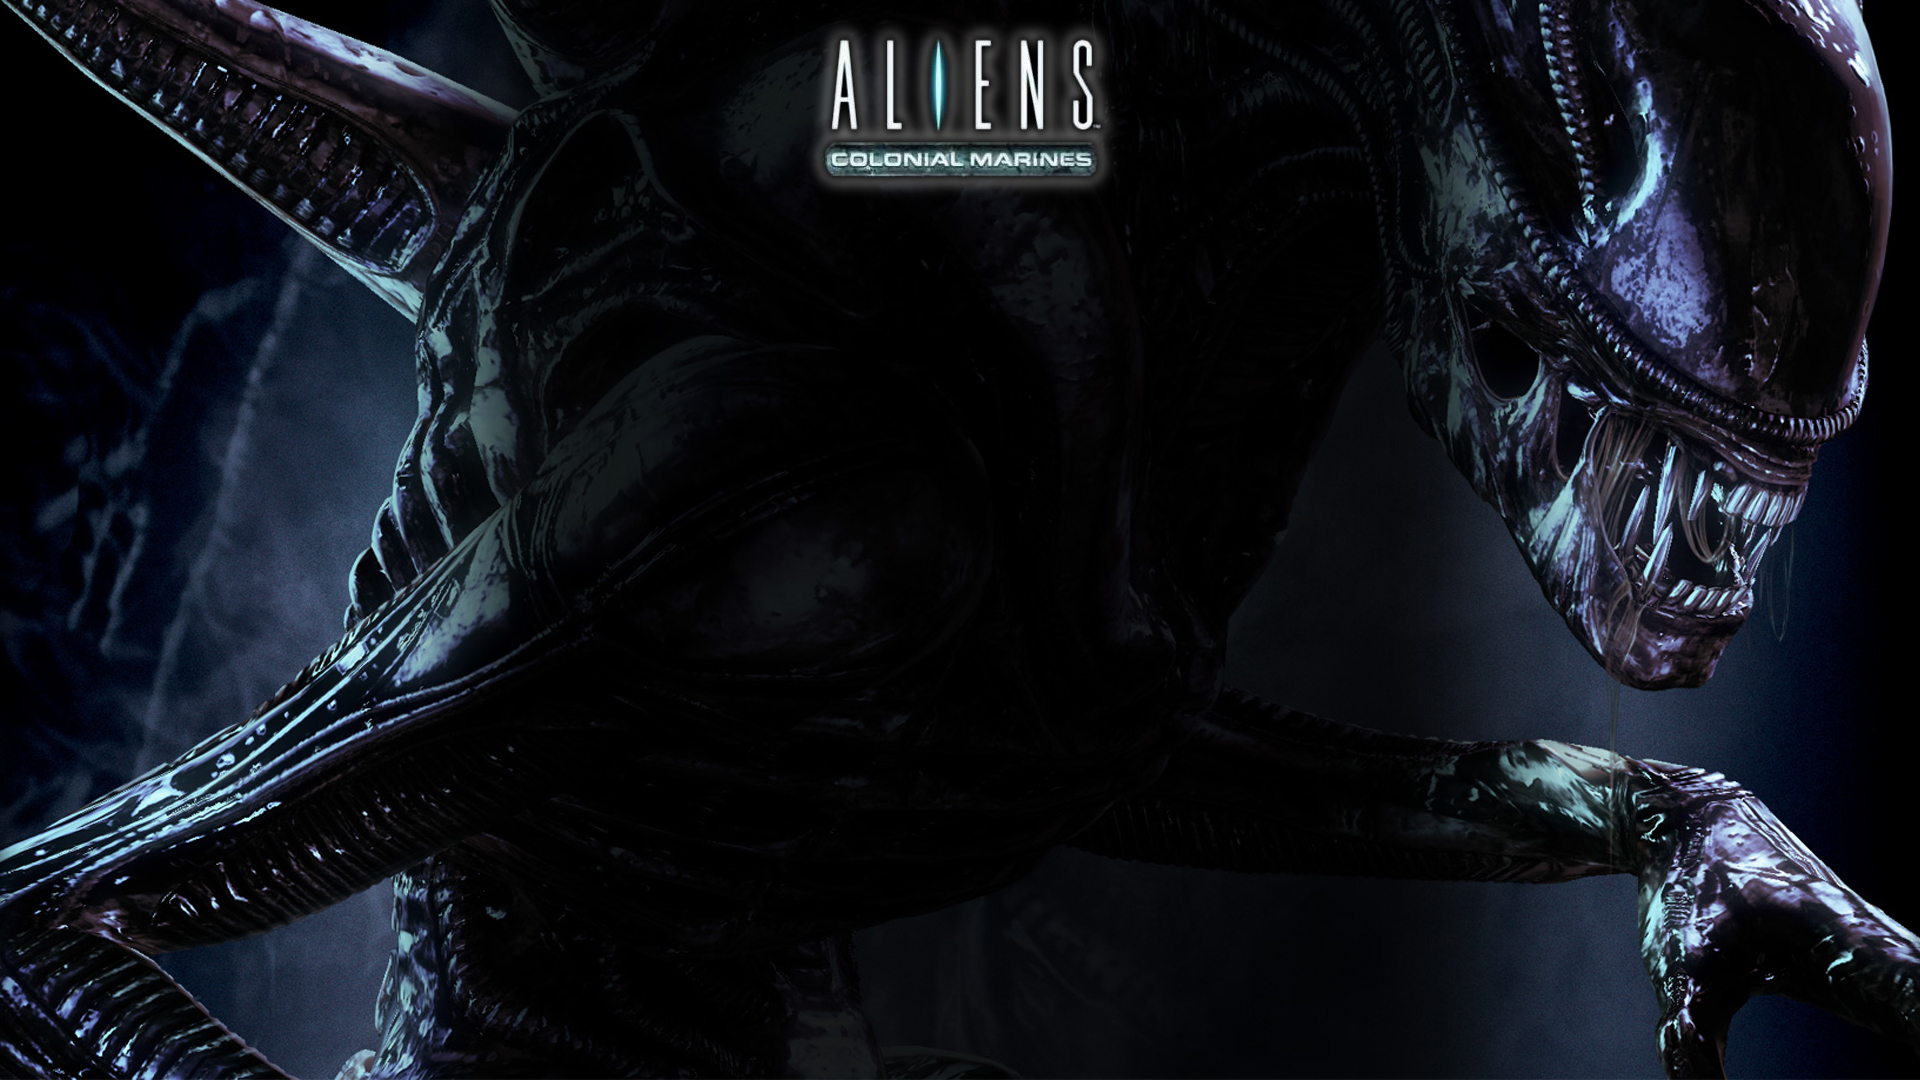 See Here Top Latest Alien Hd Wallpapers Alien Backgrounds Aliens Movie Wallpaper 1080p 1600x900 Download Hd Wallpaper Wallpapertip